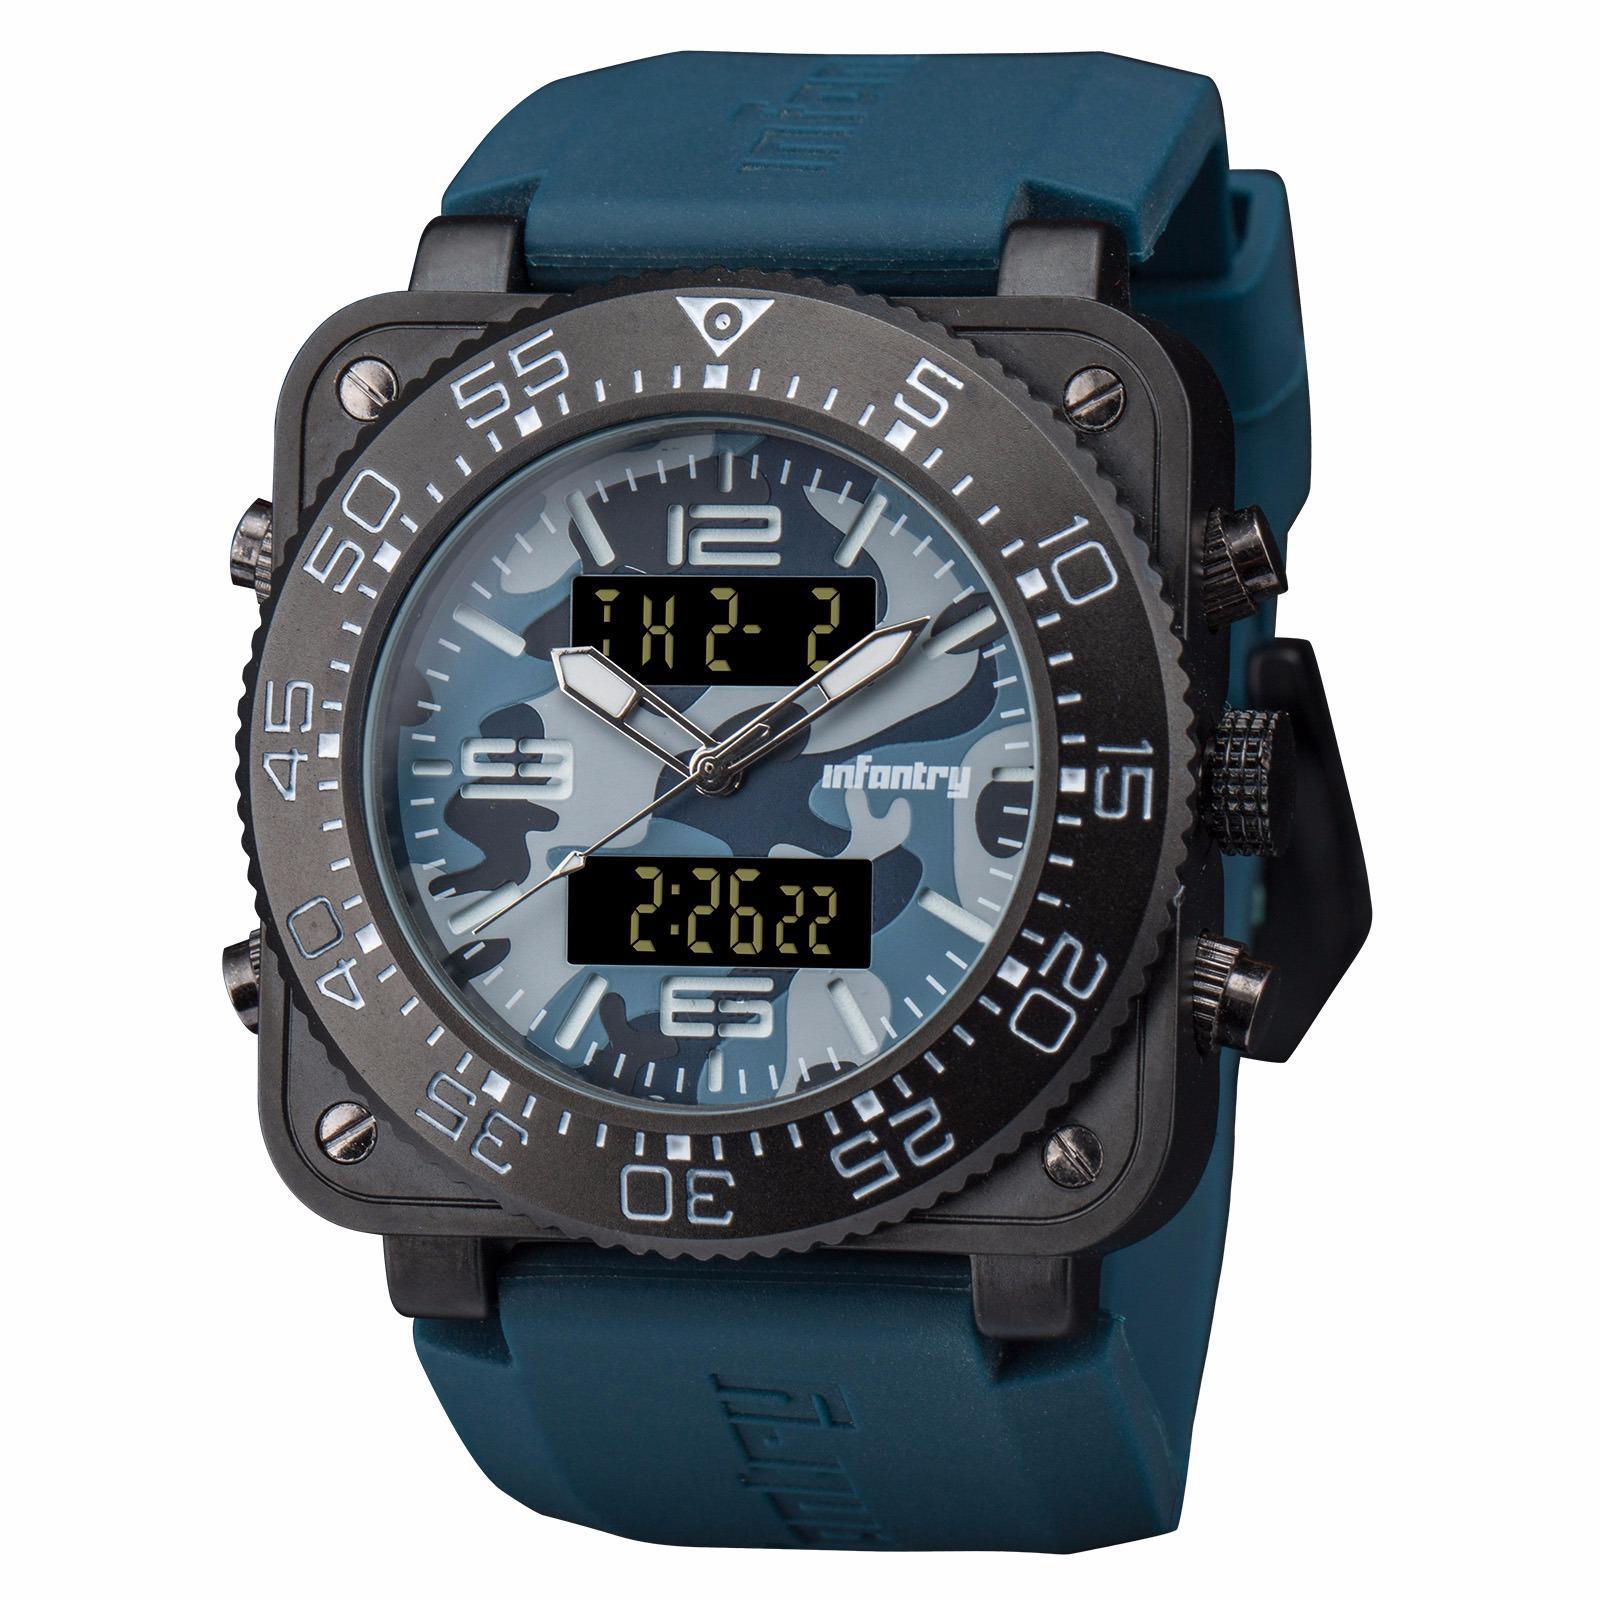 INFANTRY Mens Digital Quartz Wrist Watch Stopwatch Alarm Sport LCD Chronograph